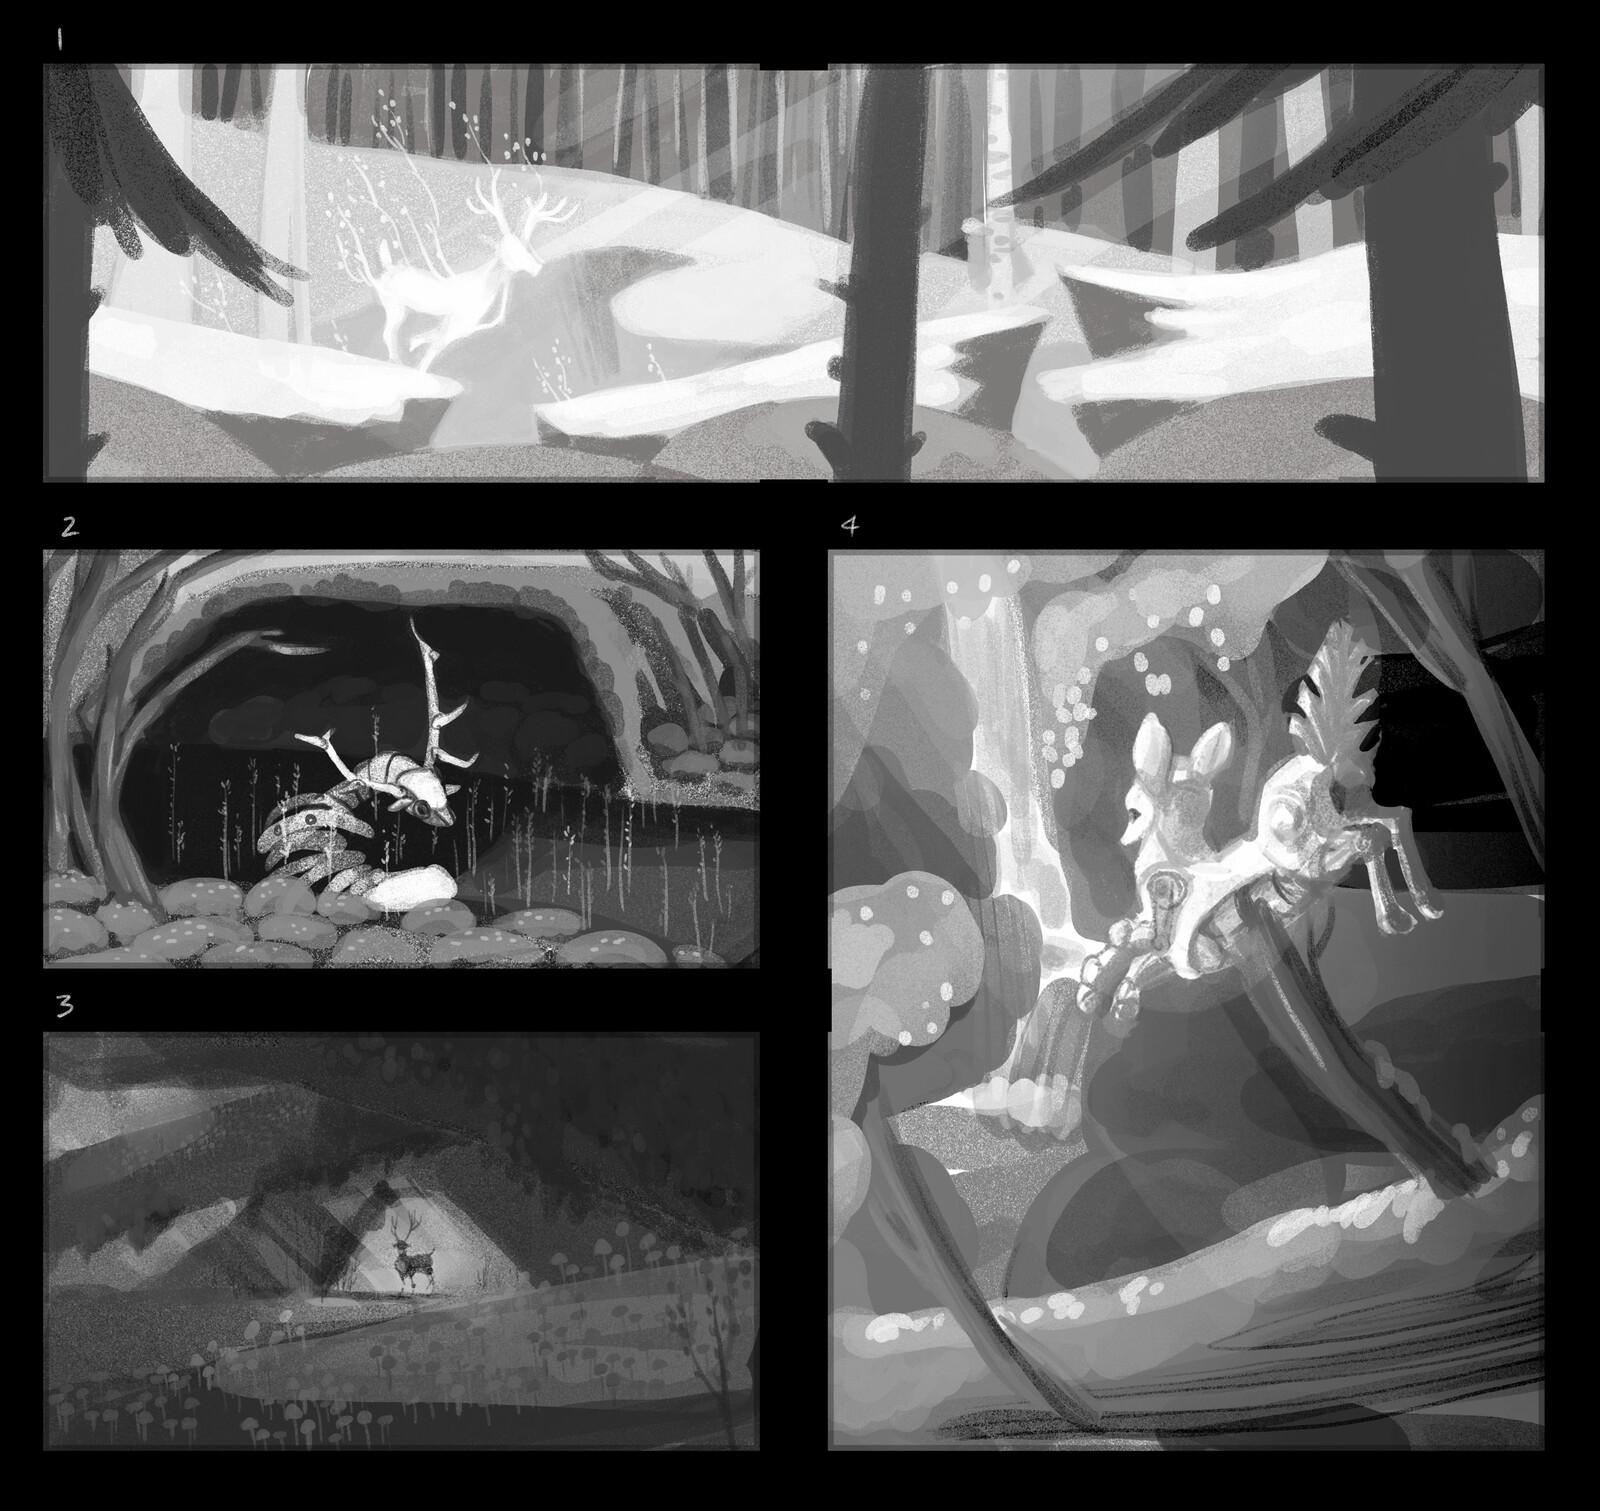 Clockwork animals - thumbnails exploration